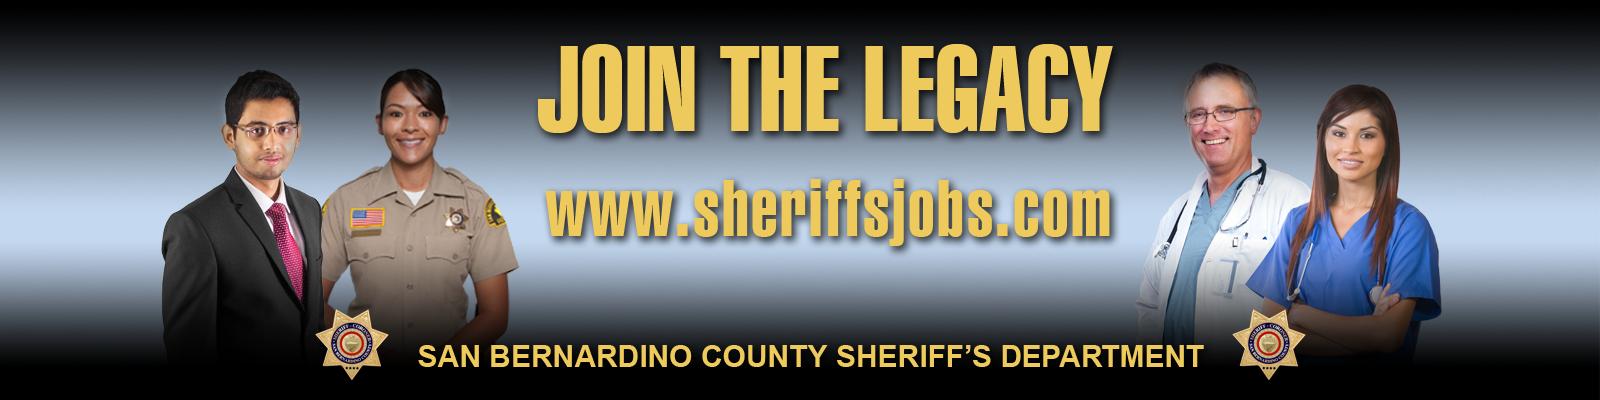 Legacy billboard for jobs website banner